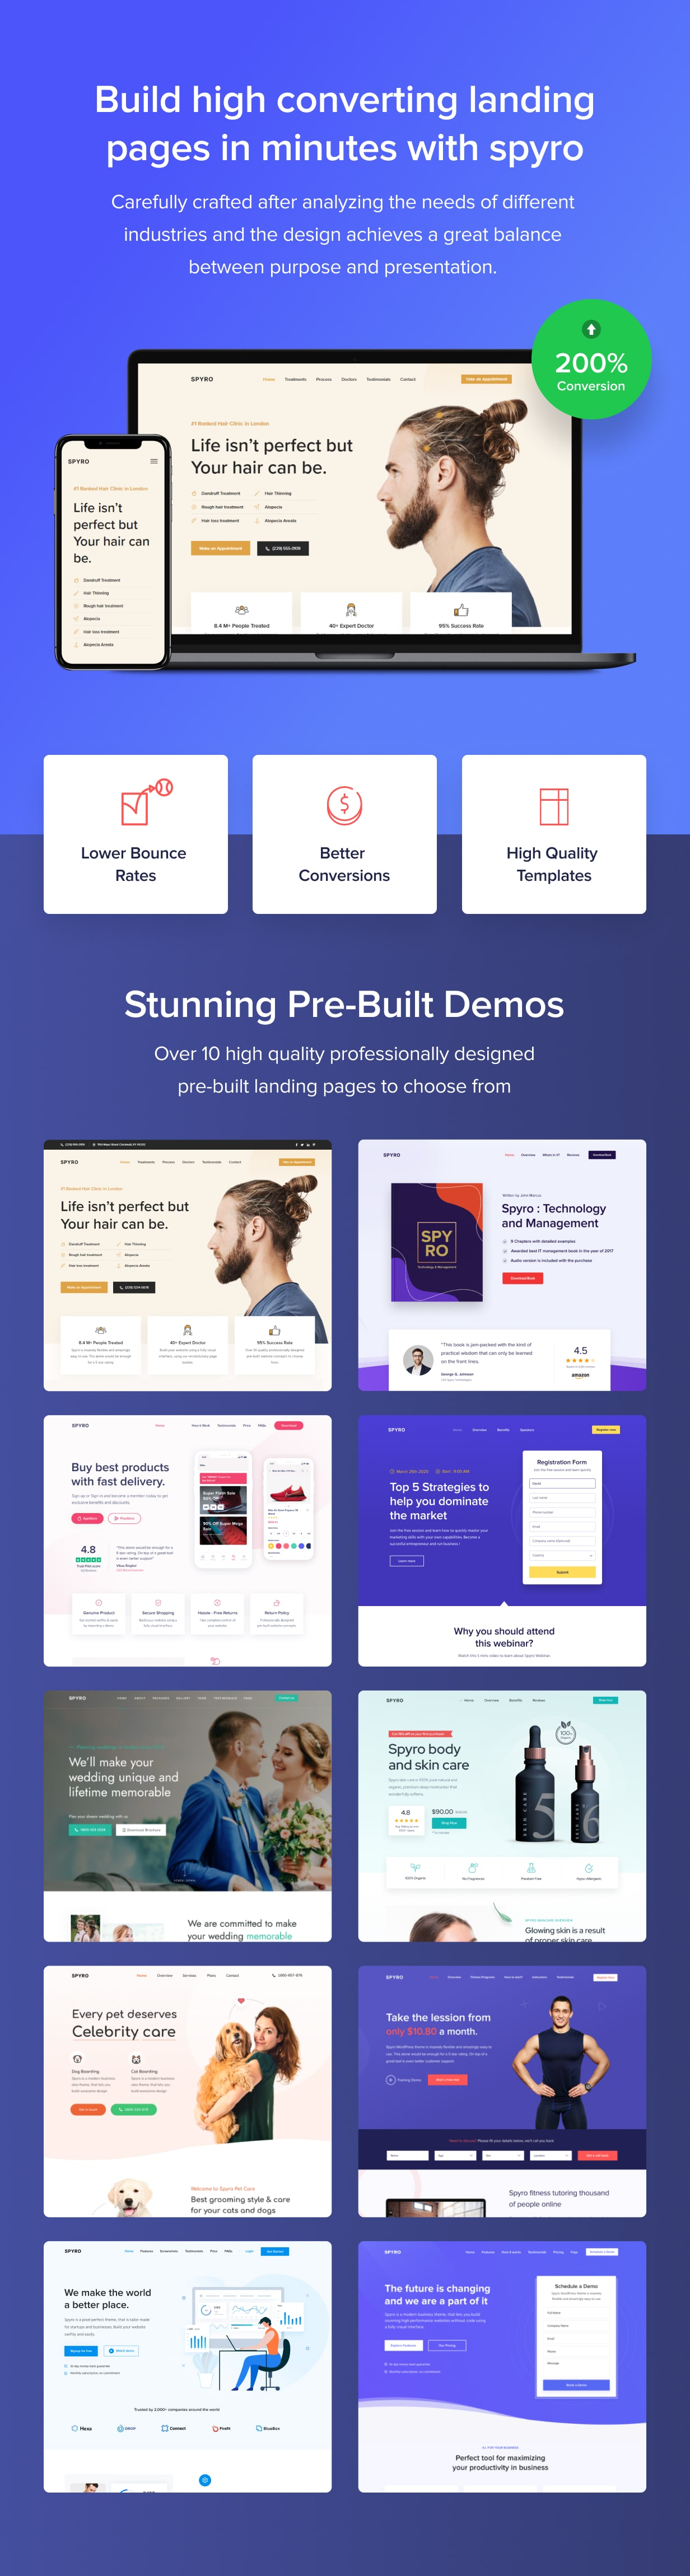 Spyro - Marketing Landing Page WordPress Theme - 2